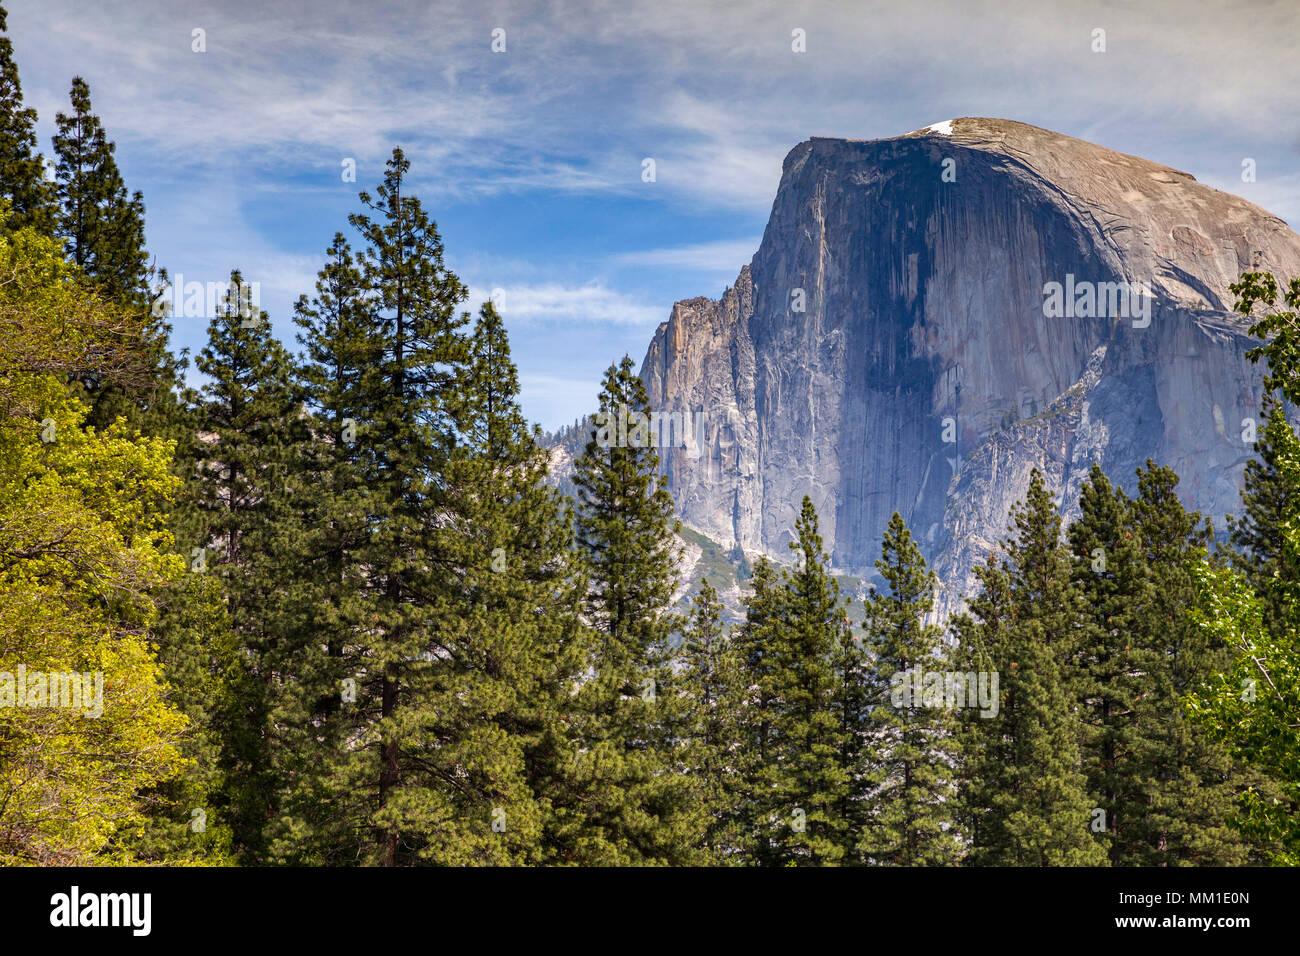 Half Dome, Yosemite National Park, California, USA,randonnée,dome,Yosemite National Park, Californie,l'Amérique,american,arbres,paysages,paysage,scenic Photo Stock